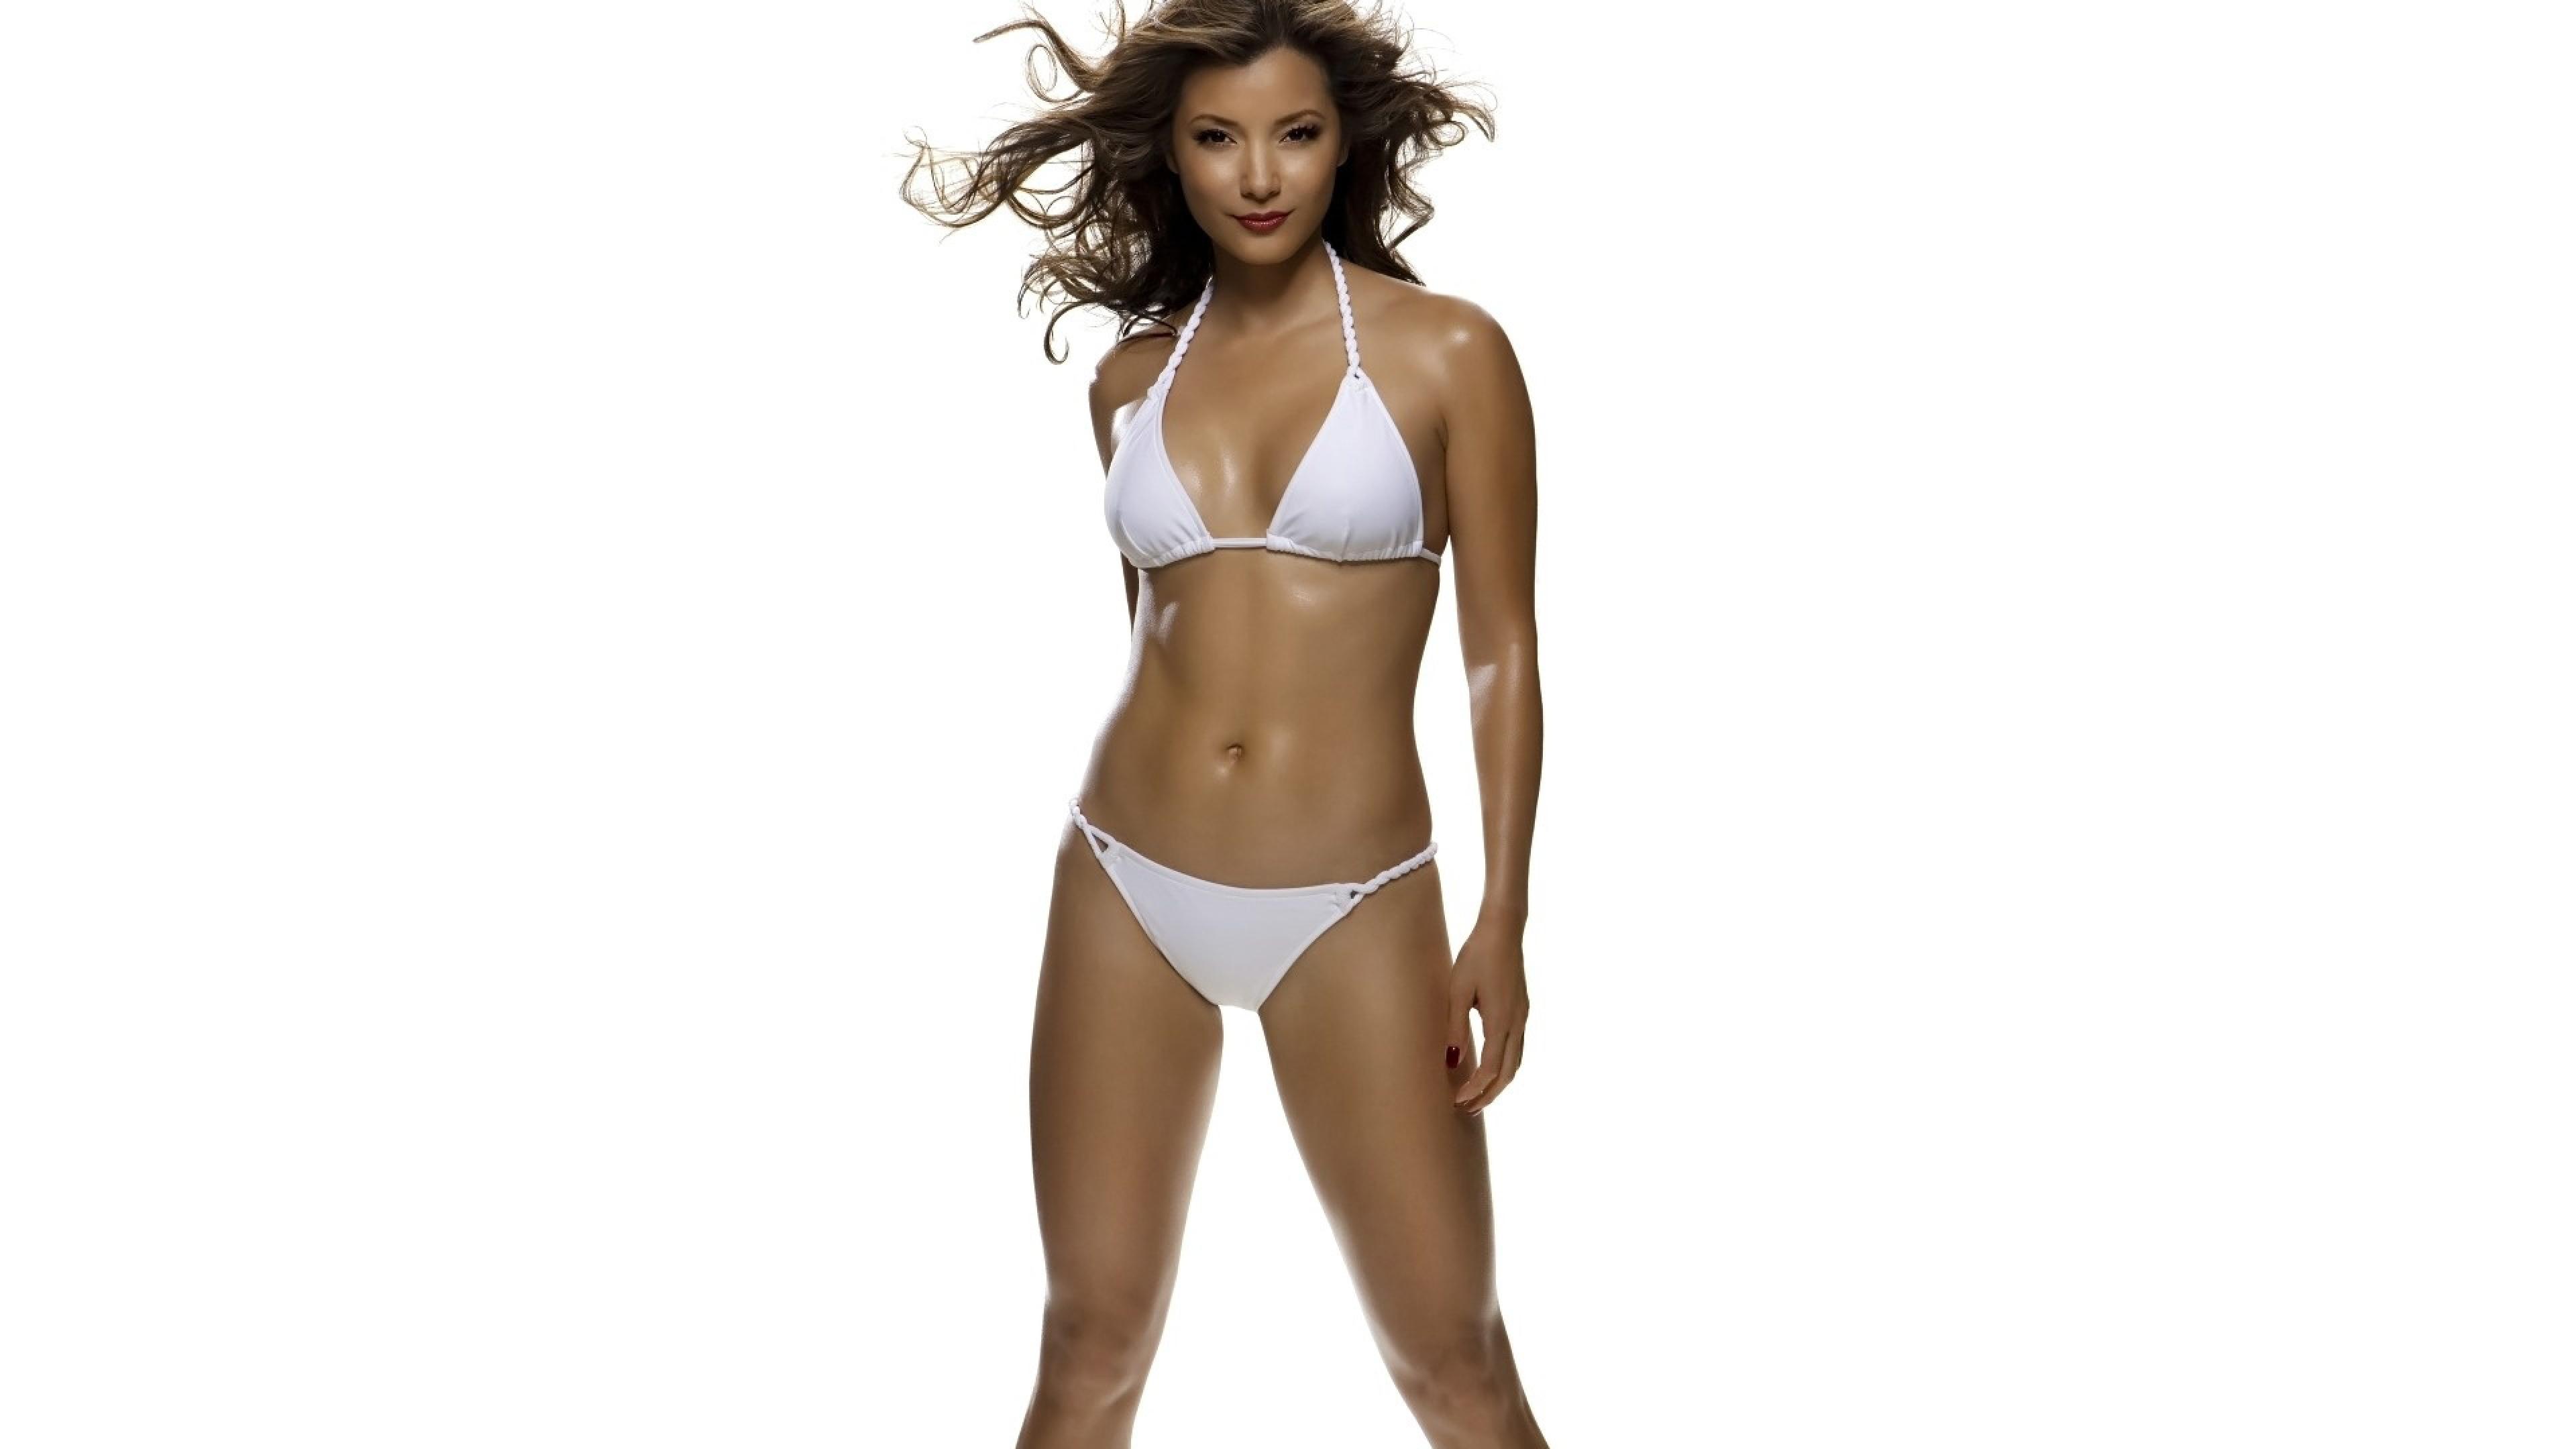 Kelly hu in white bikini sexy photoshoot full hd wallpaper - Hd bikini wallpapers for pc ...